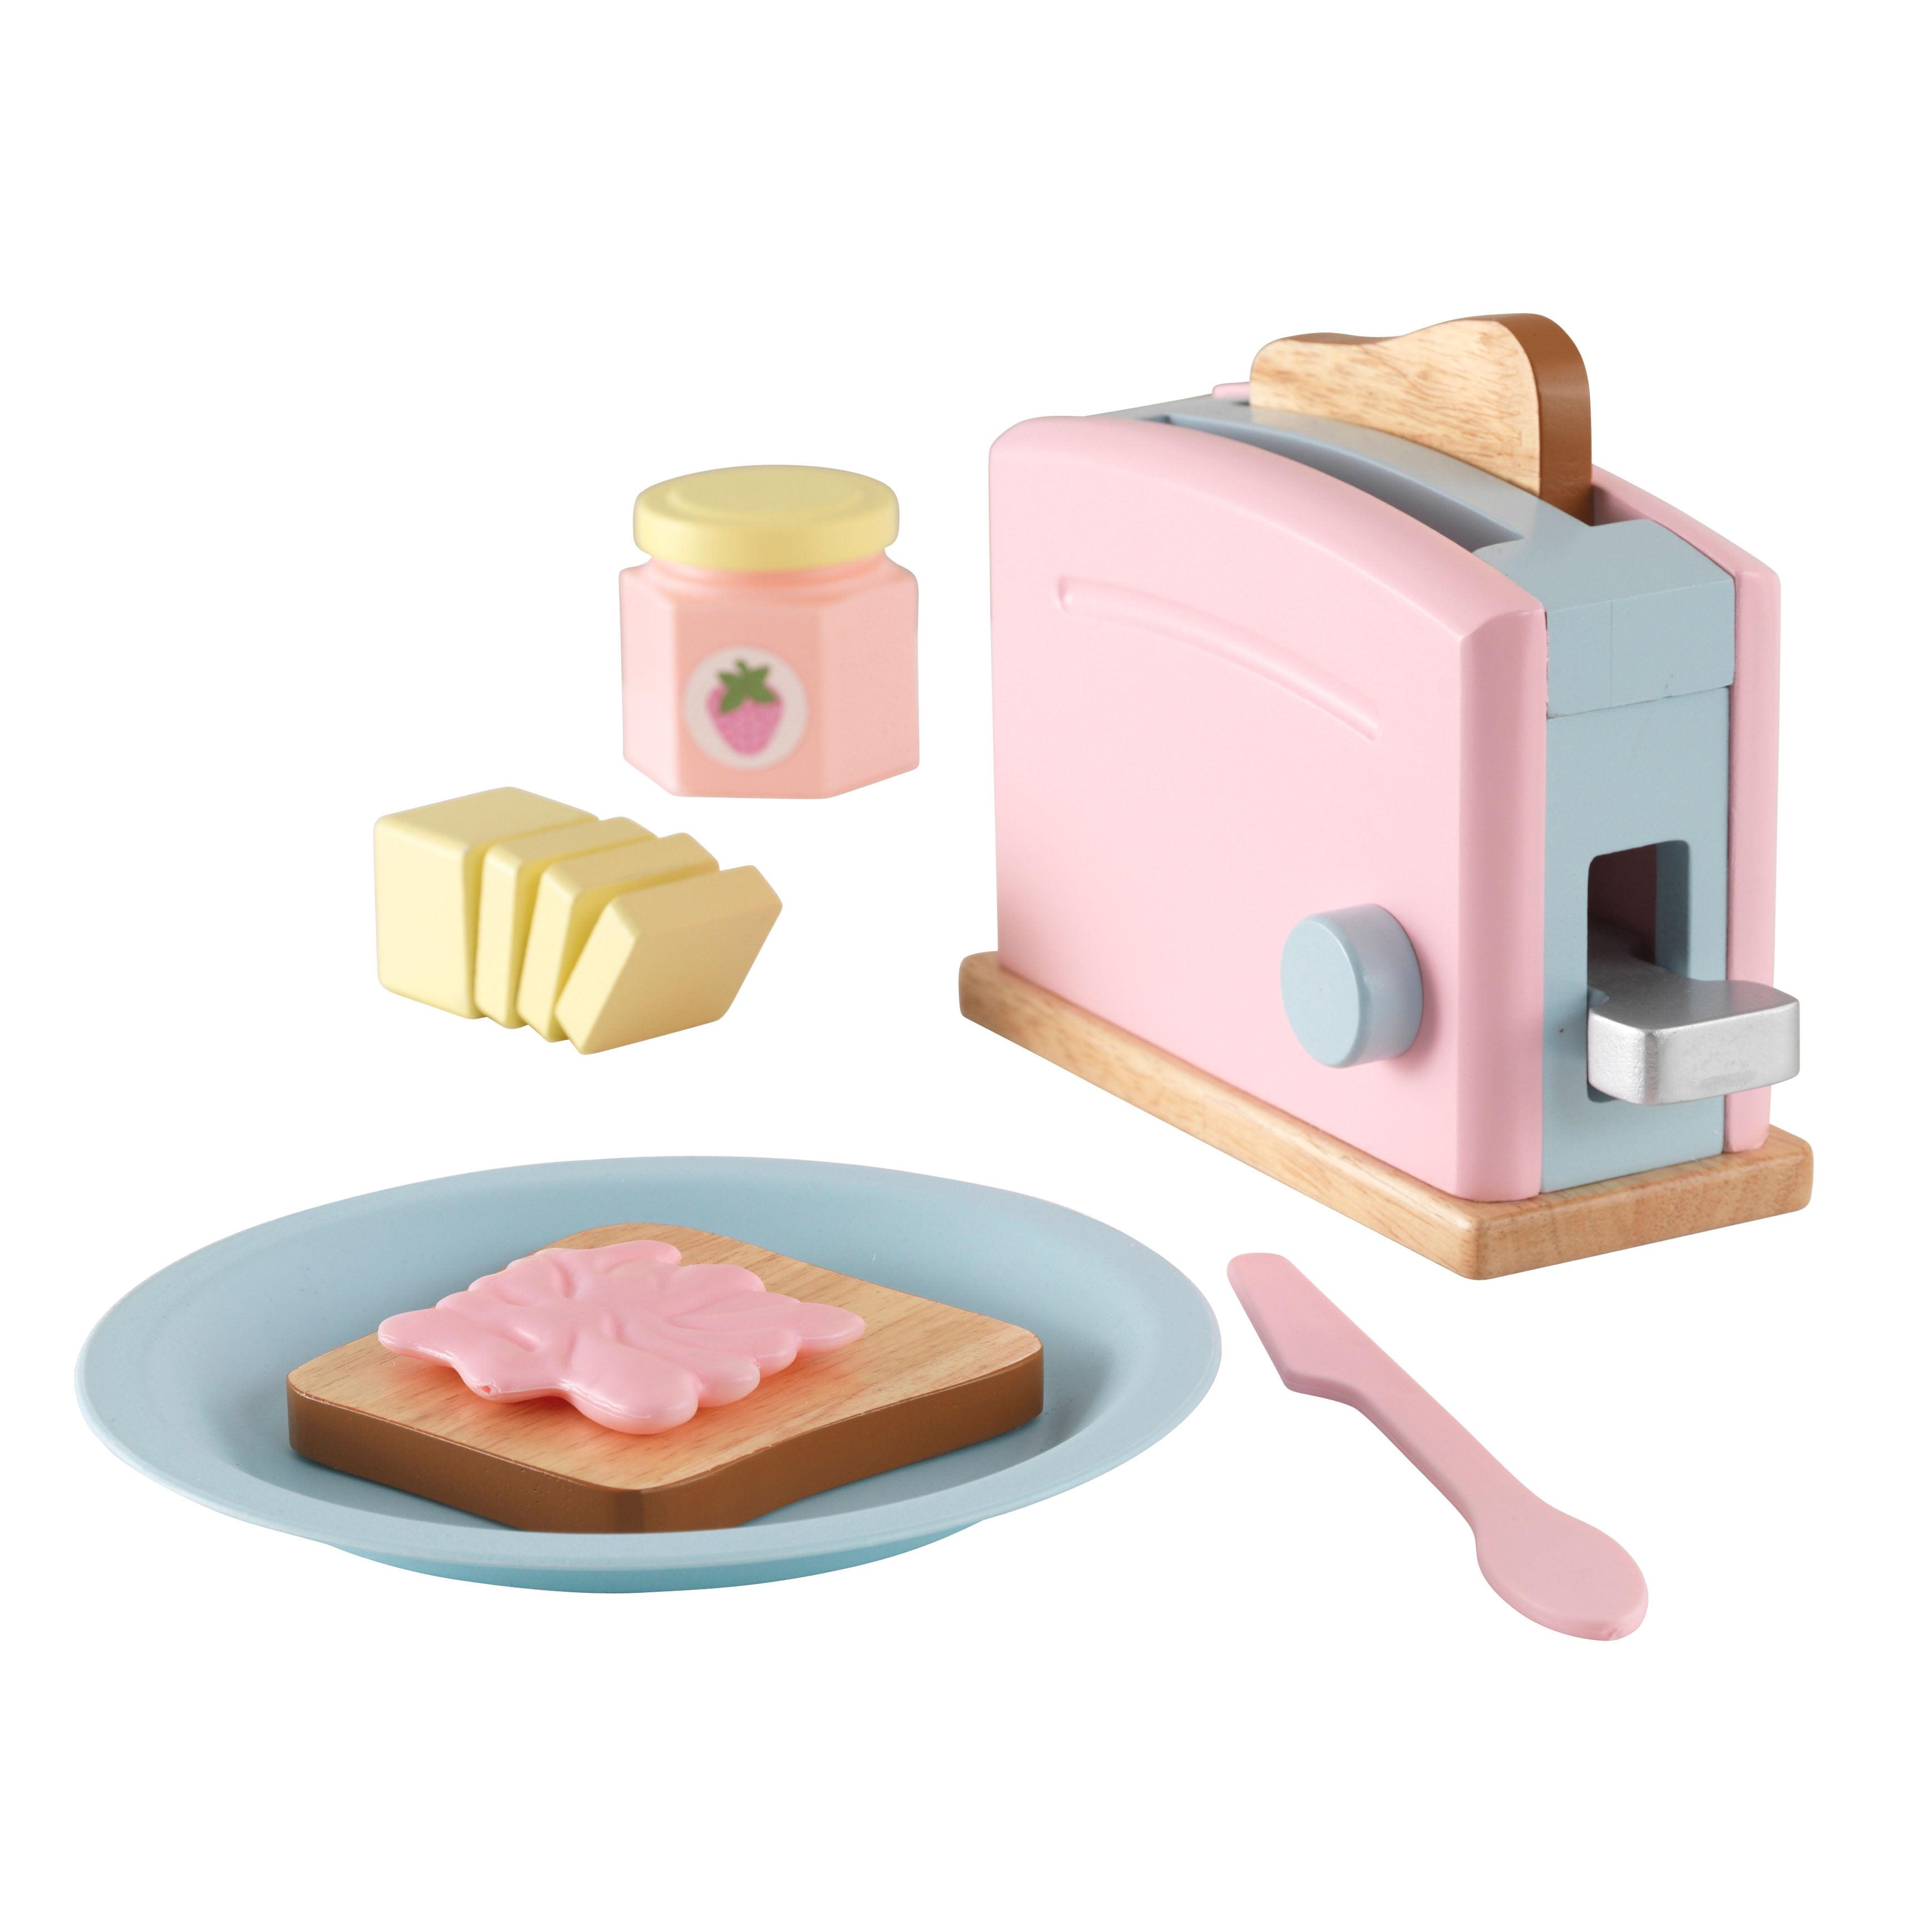 KidKraft Toaster Set Pastel by KidKraft